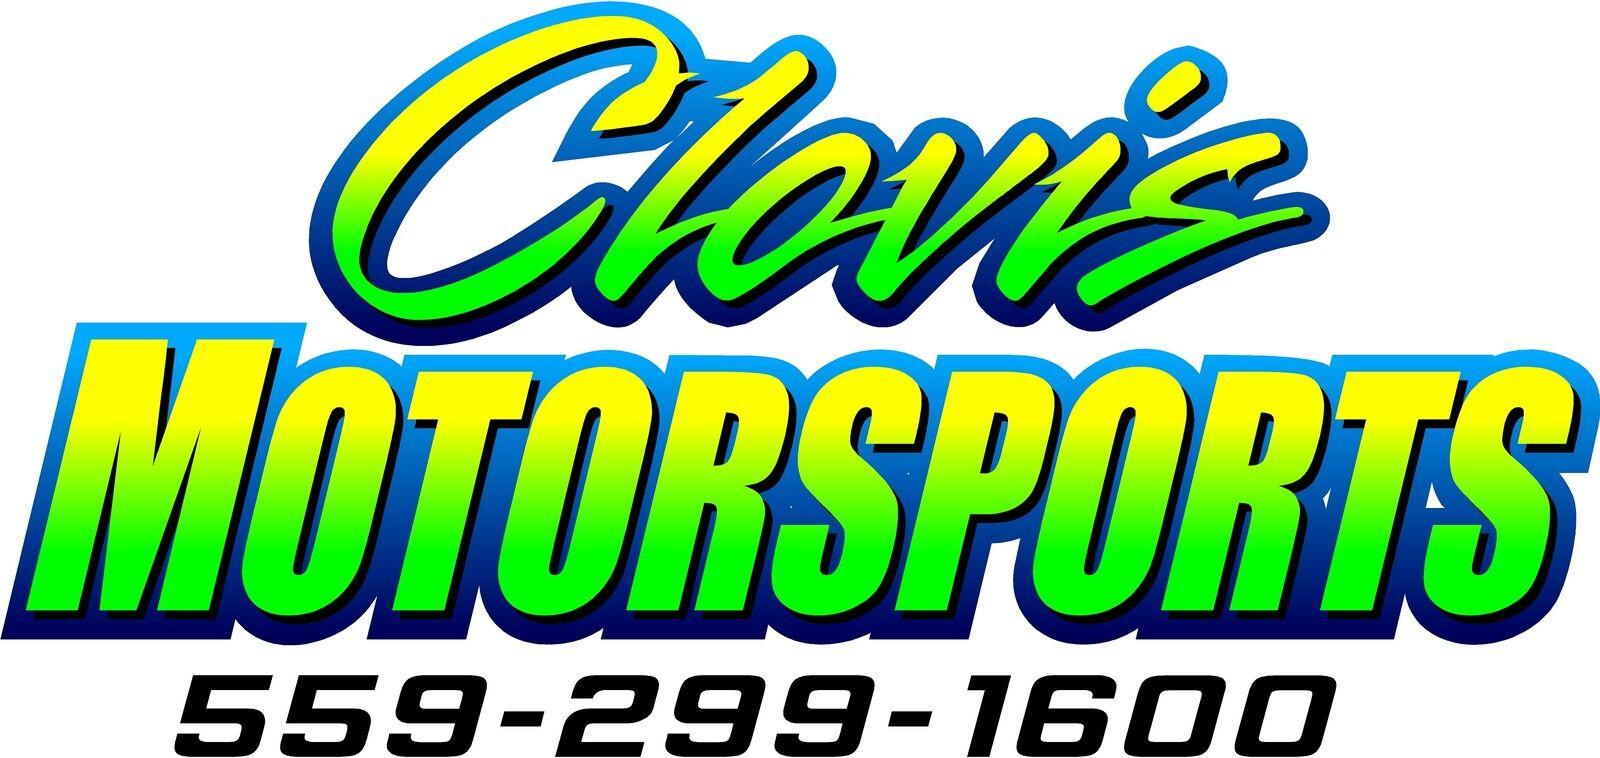 CKAM CORP. dba Clovis Motorsports